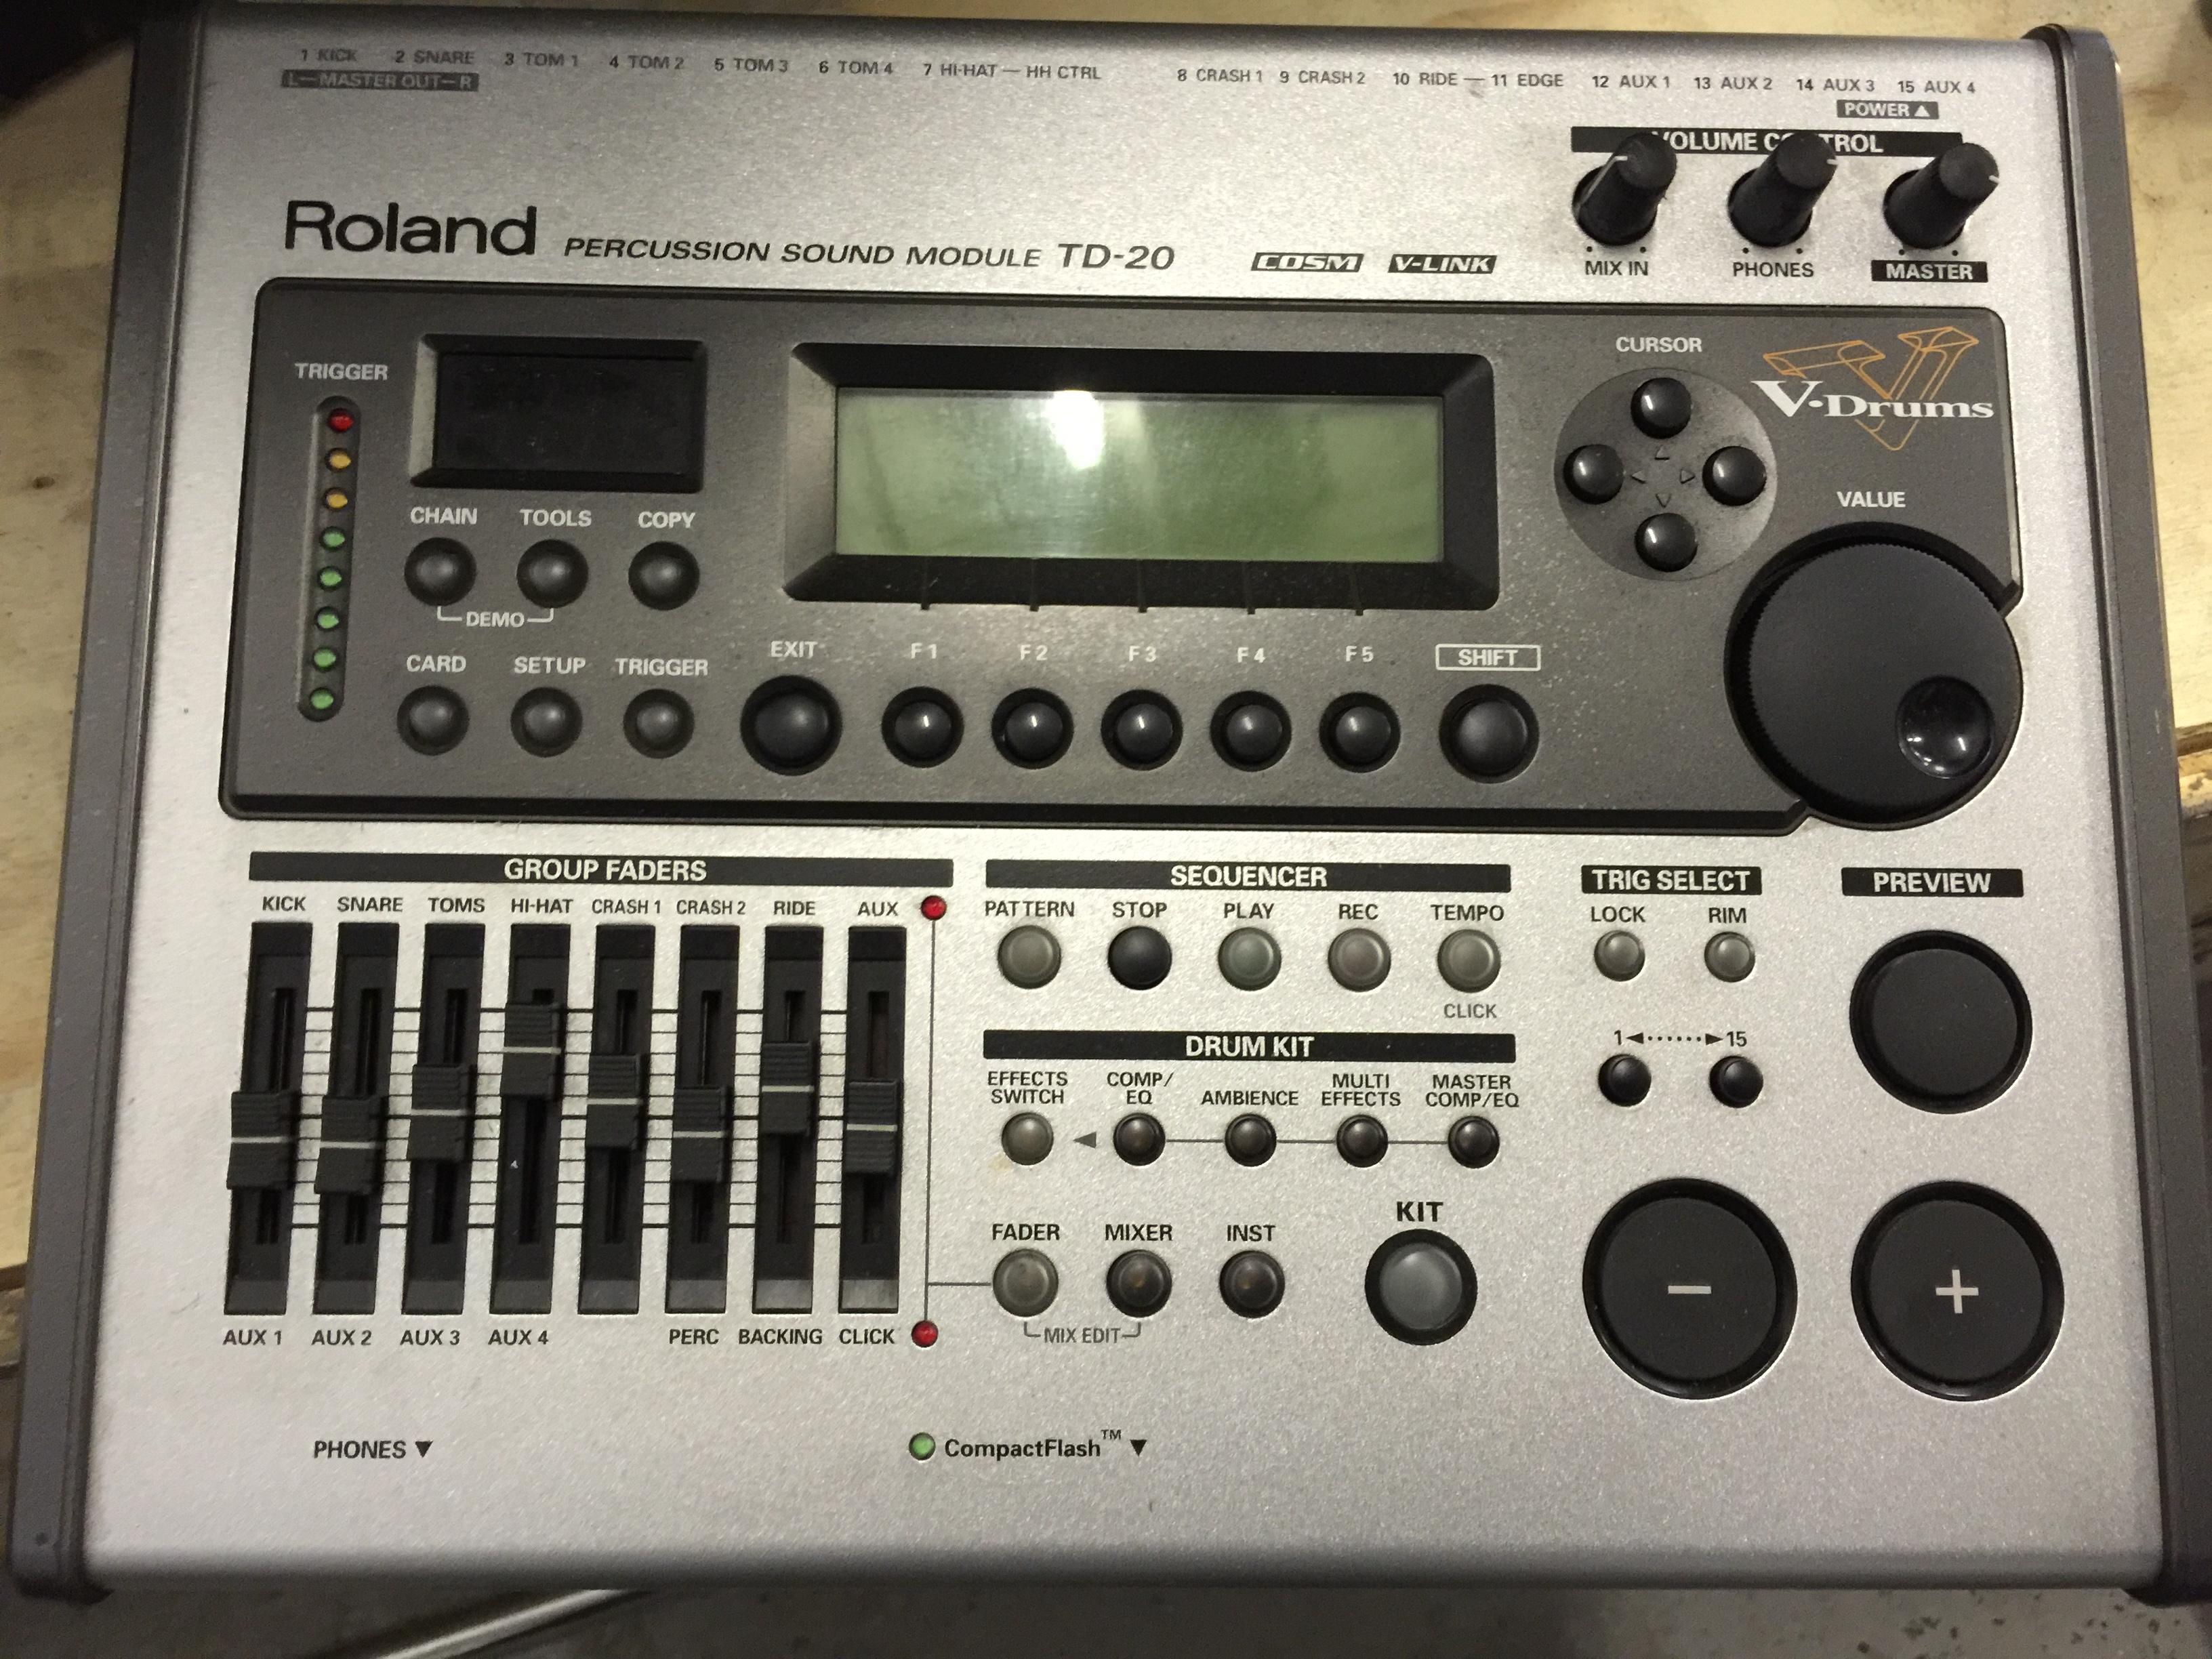 MOTORHEAD & PHILTHY ANIMAL - Phil's Roland TD20 V-Pro Series Electronic Drum Kit. - Image 5 of 5